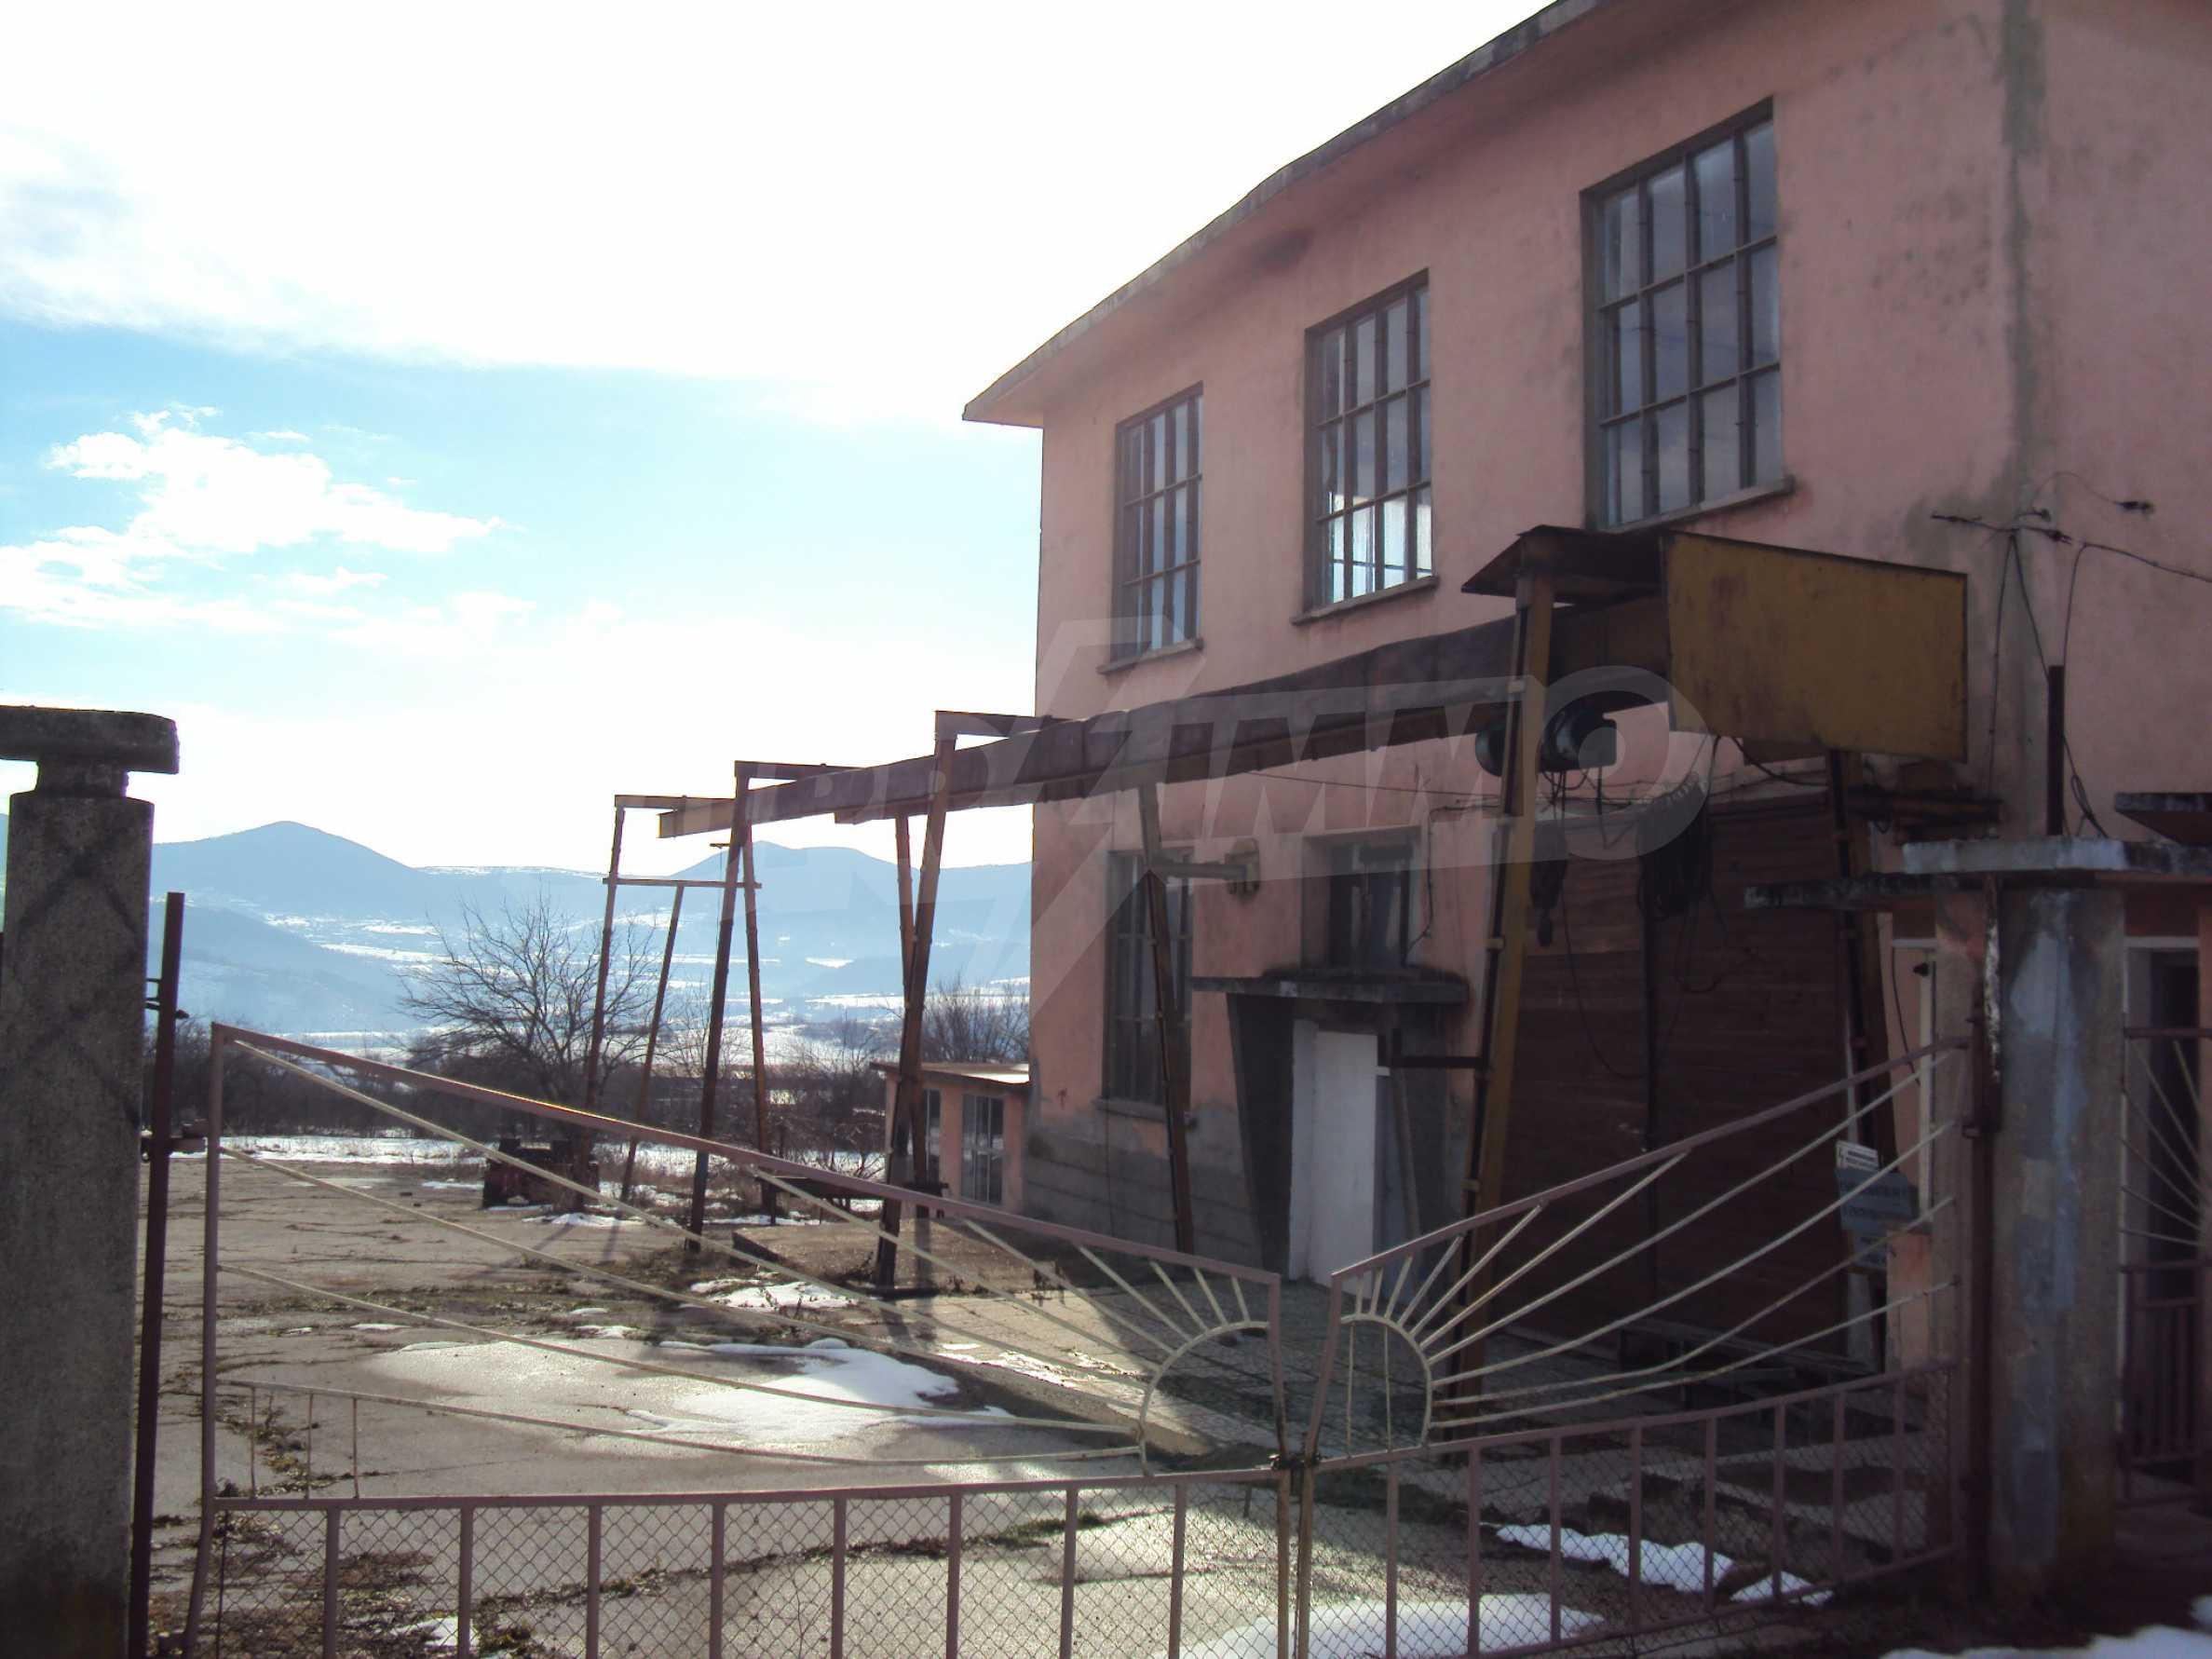 Fabrik in der Nähe von Veliko Tarnovo 25